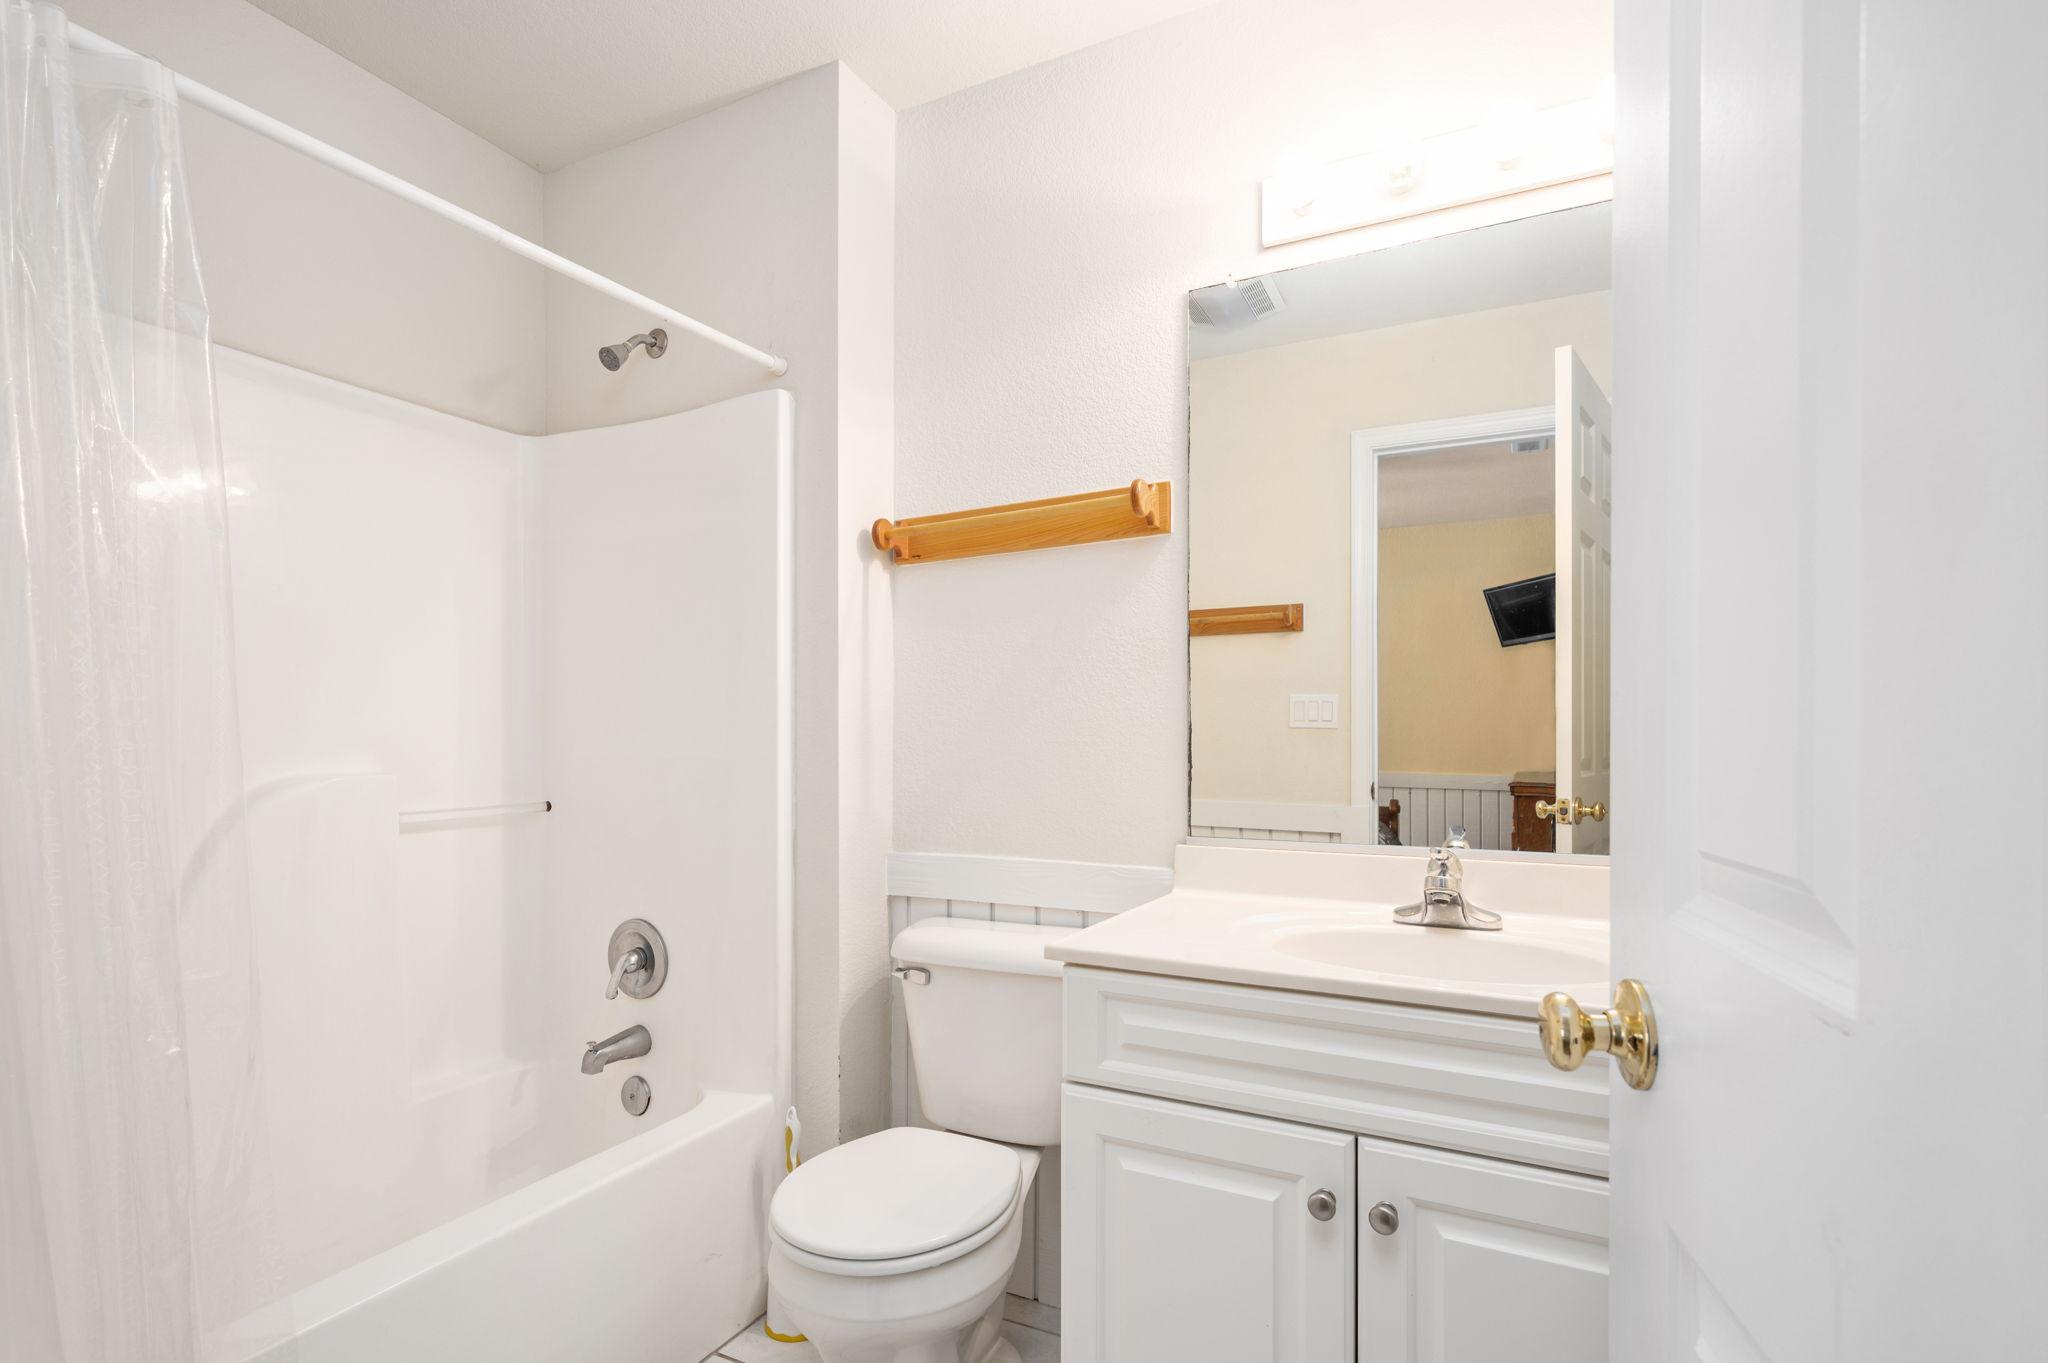 795 Mercury Road   Bottom Level Bedroom 2 - Private Bath